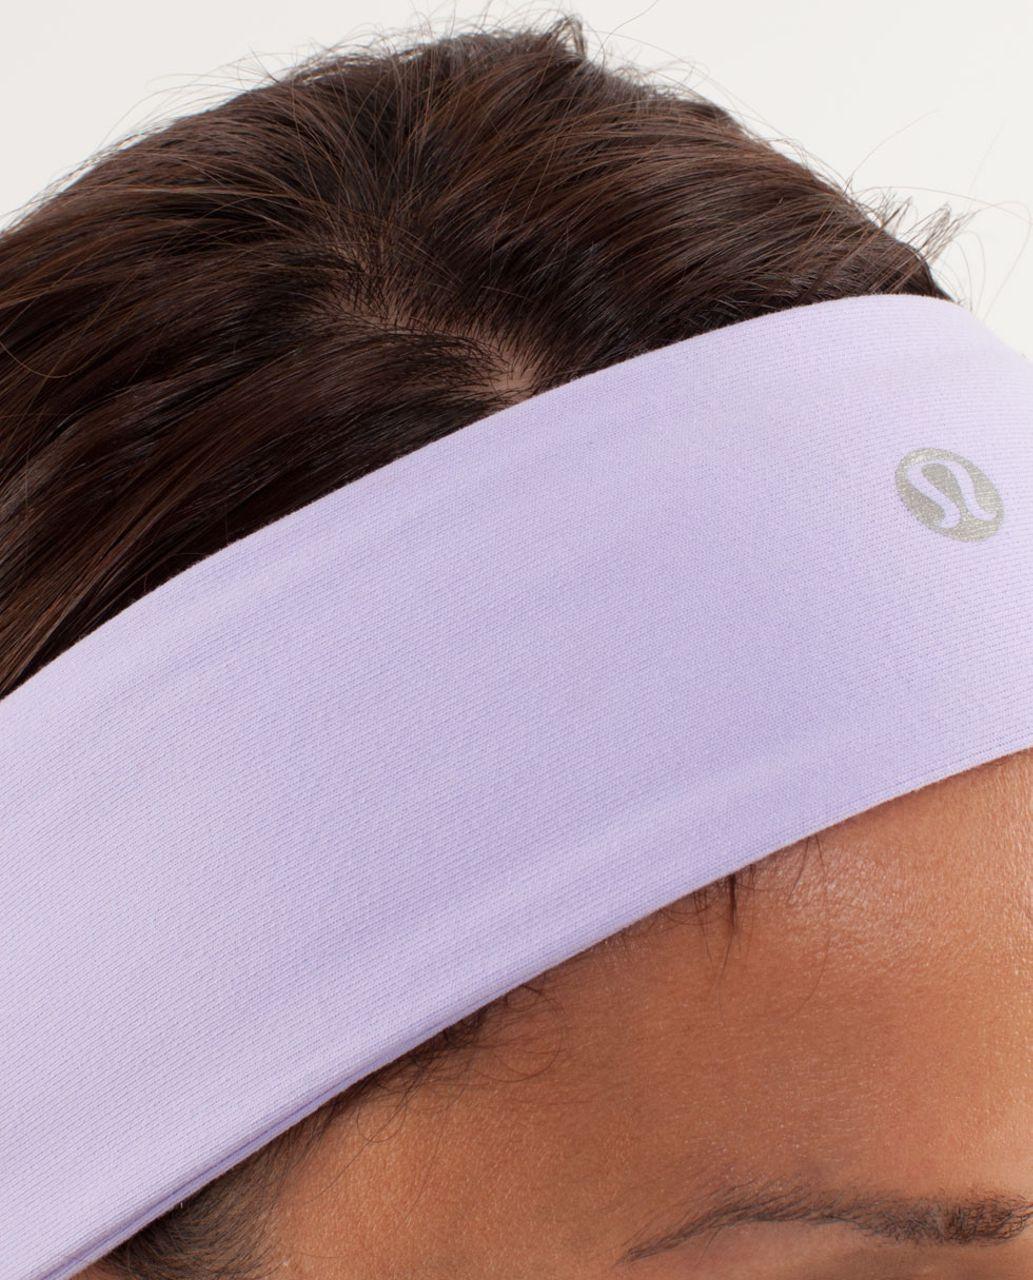 Lululemon Lucky Luon Headband - Lilac